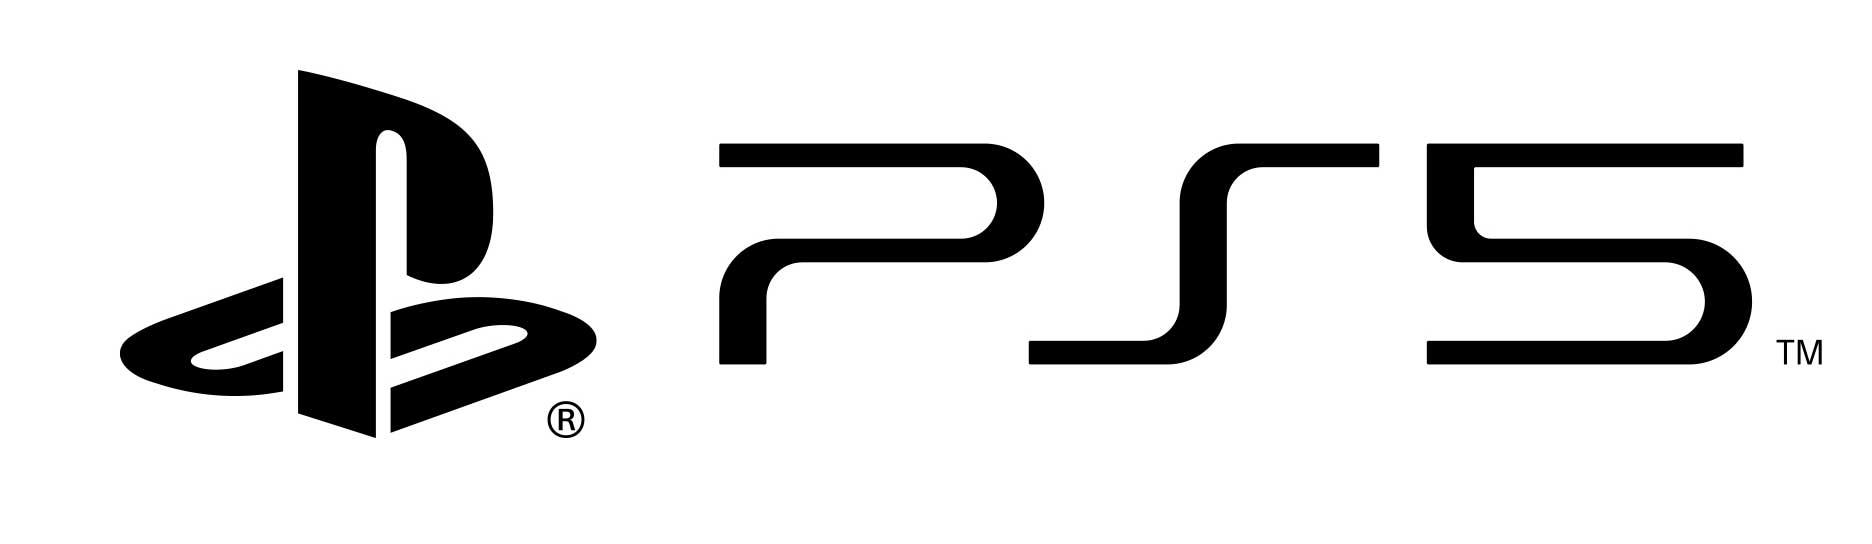 Ventole Playstation 5